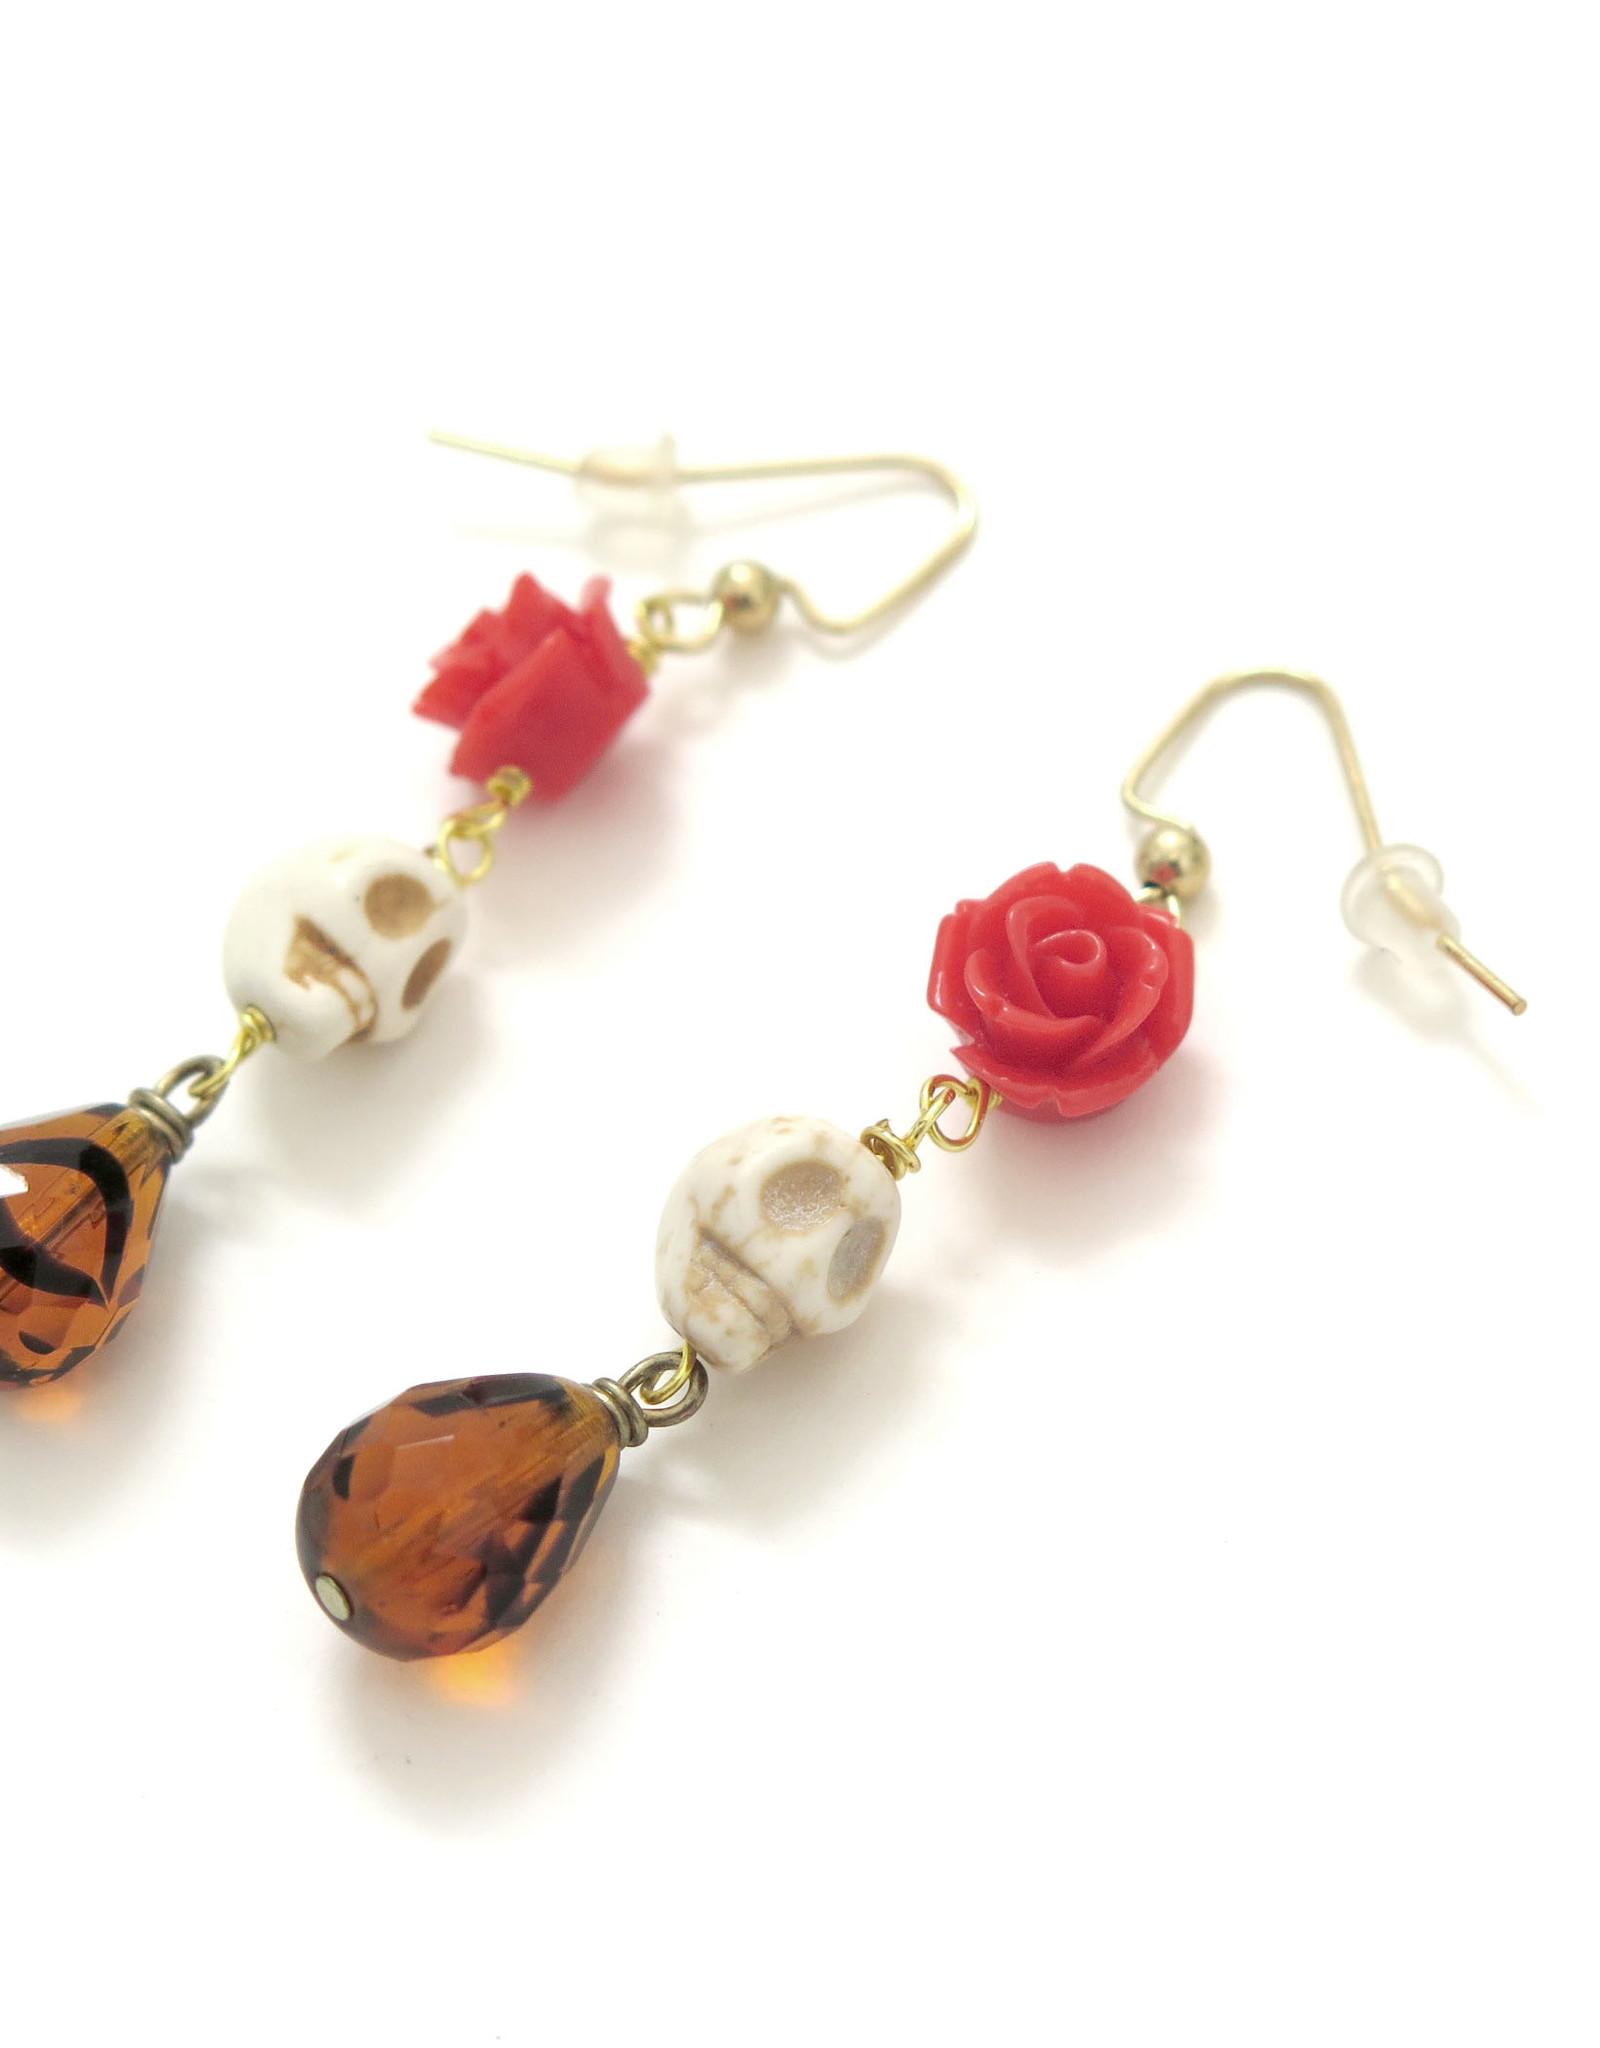 Skull Earrings with Rose by Dana Diederich